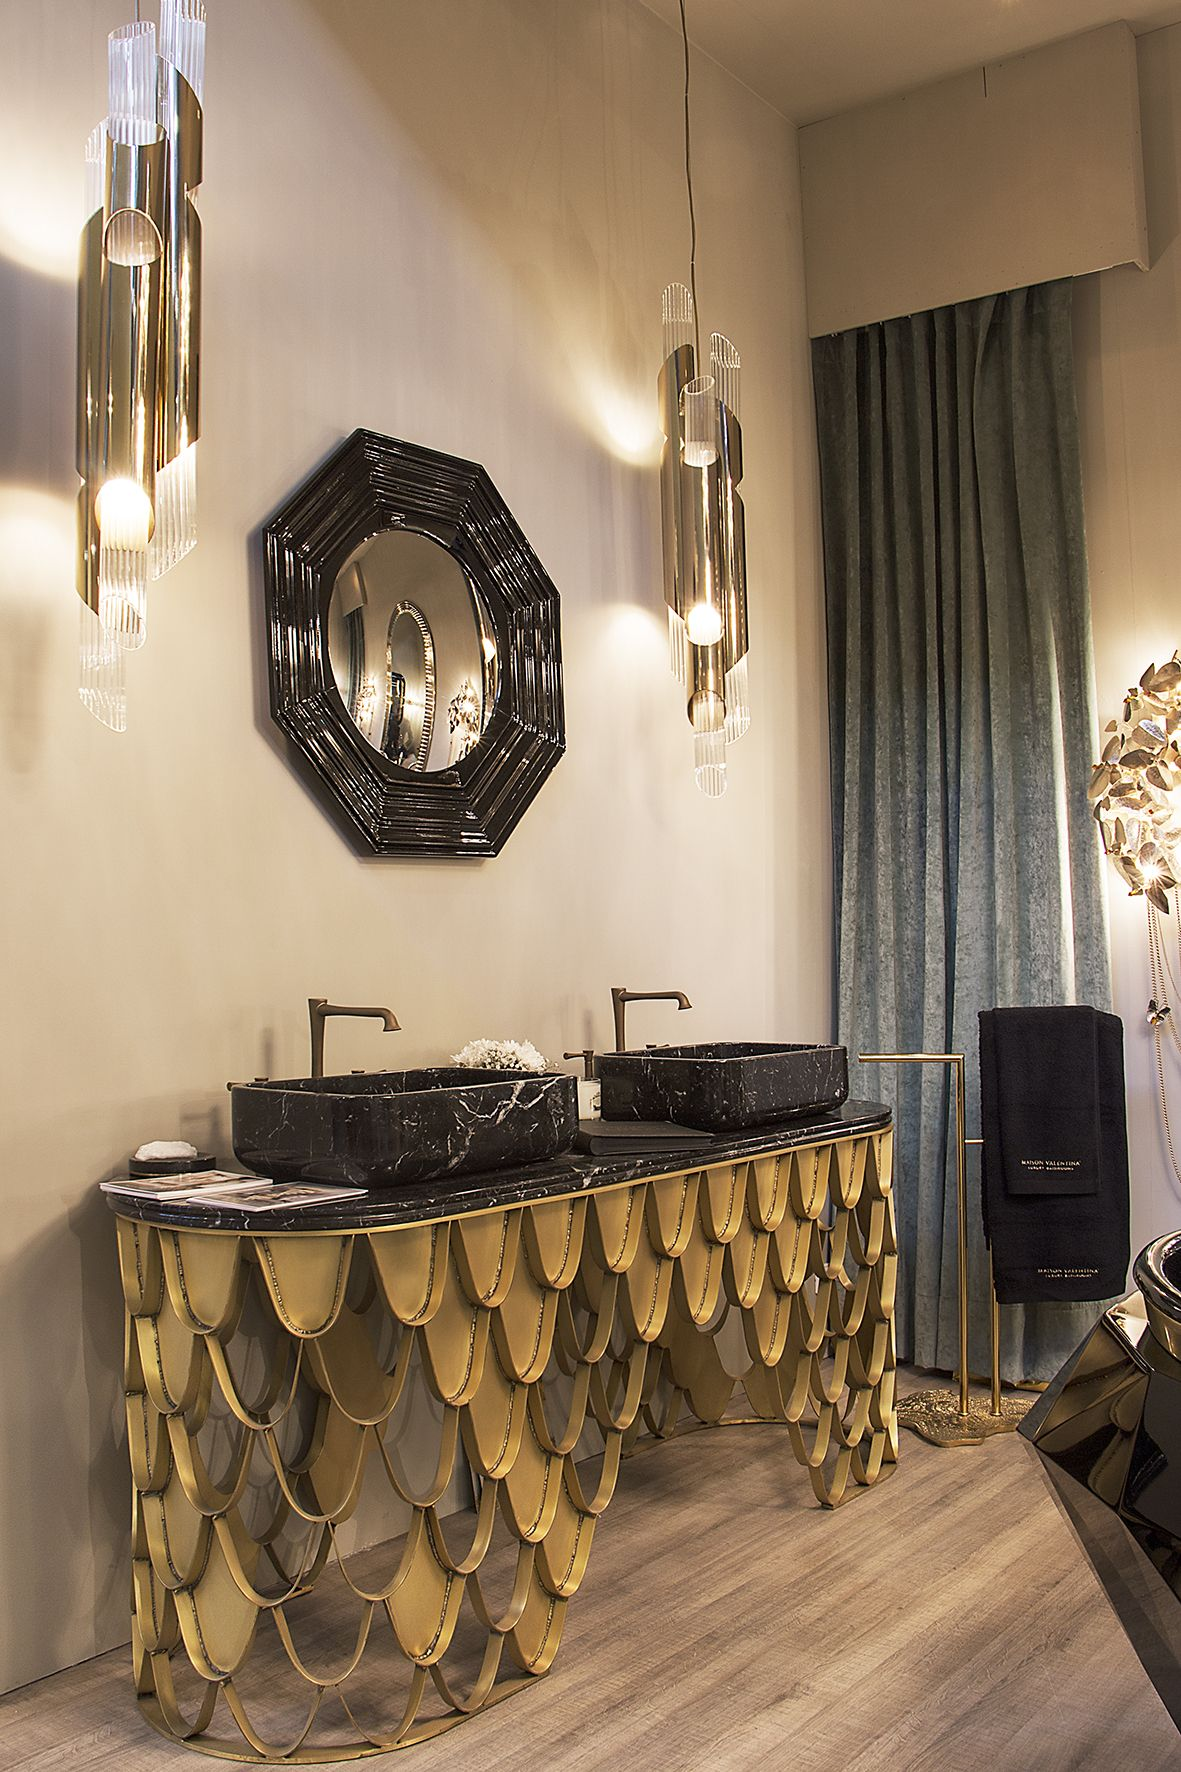 The amazing Draycott Pendant in its debut at Maison et Objet Paris September edition. Feel inspired: www.luxxu.net | #interiordesign #luxurydesign #lightingdesign